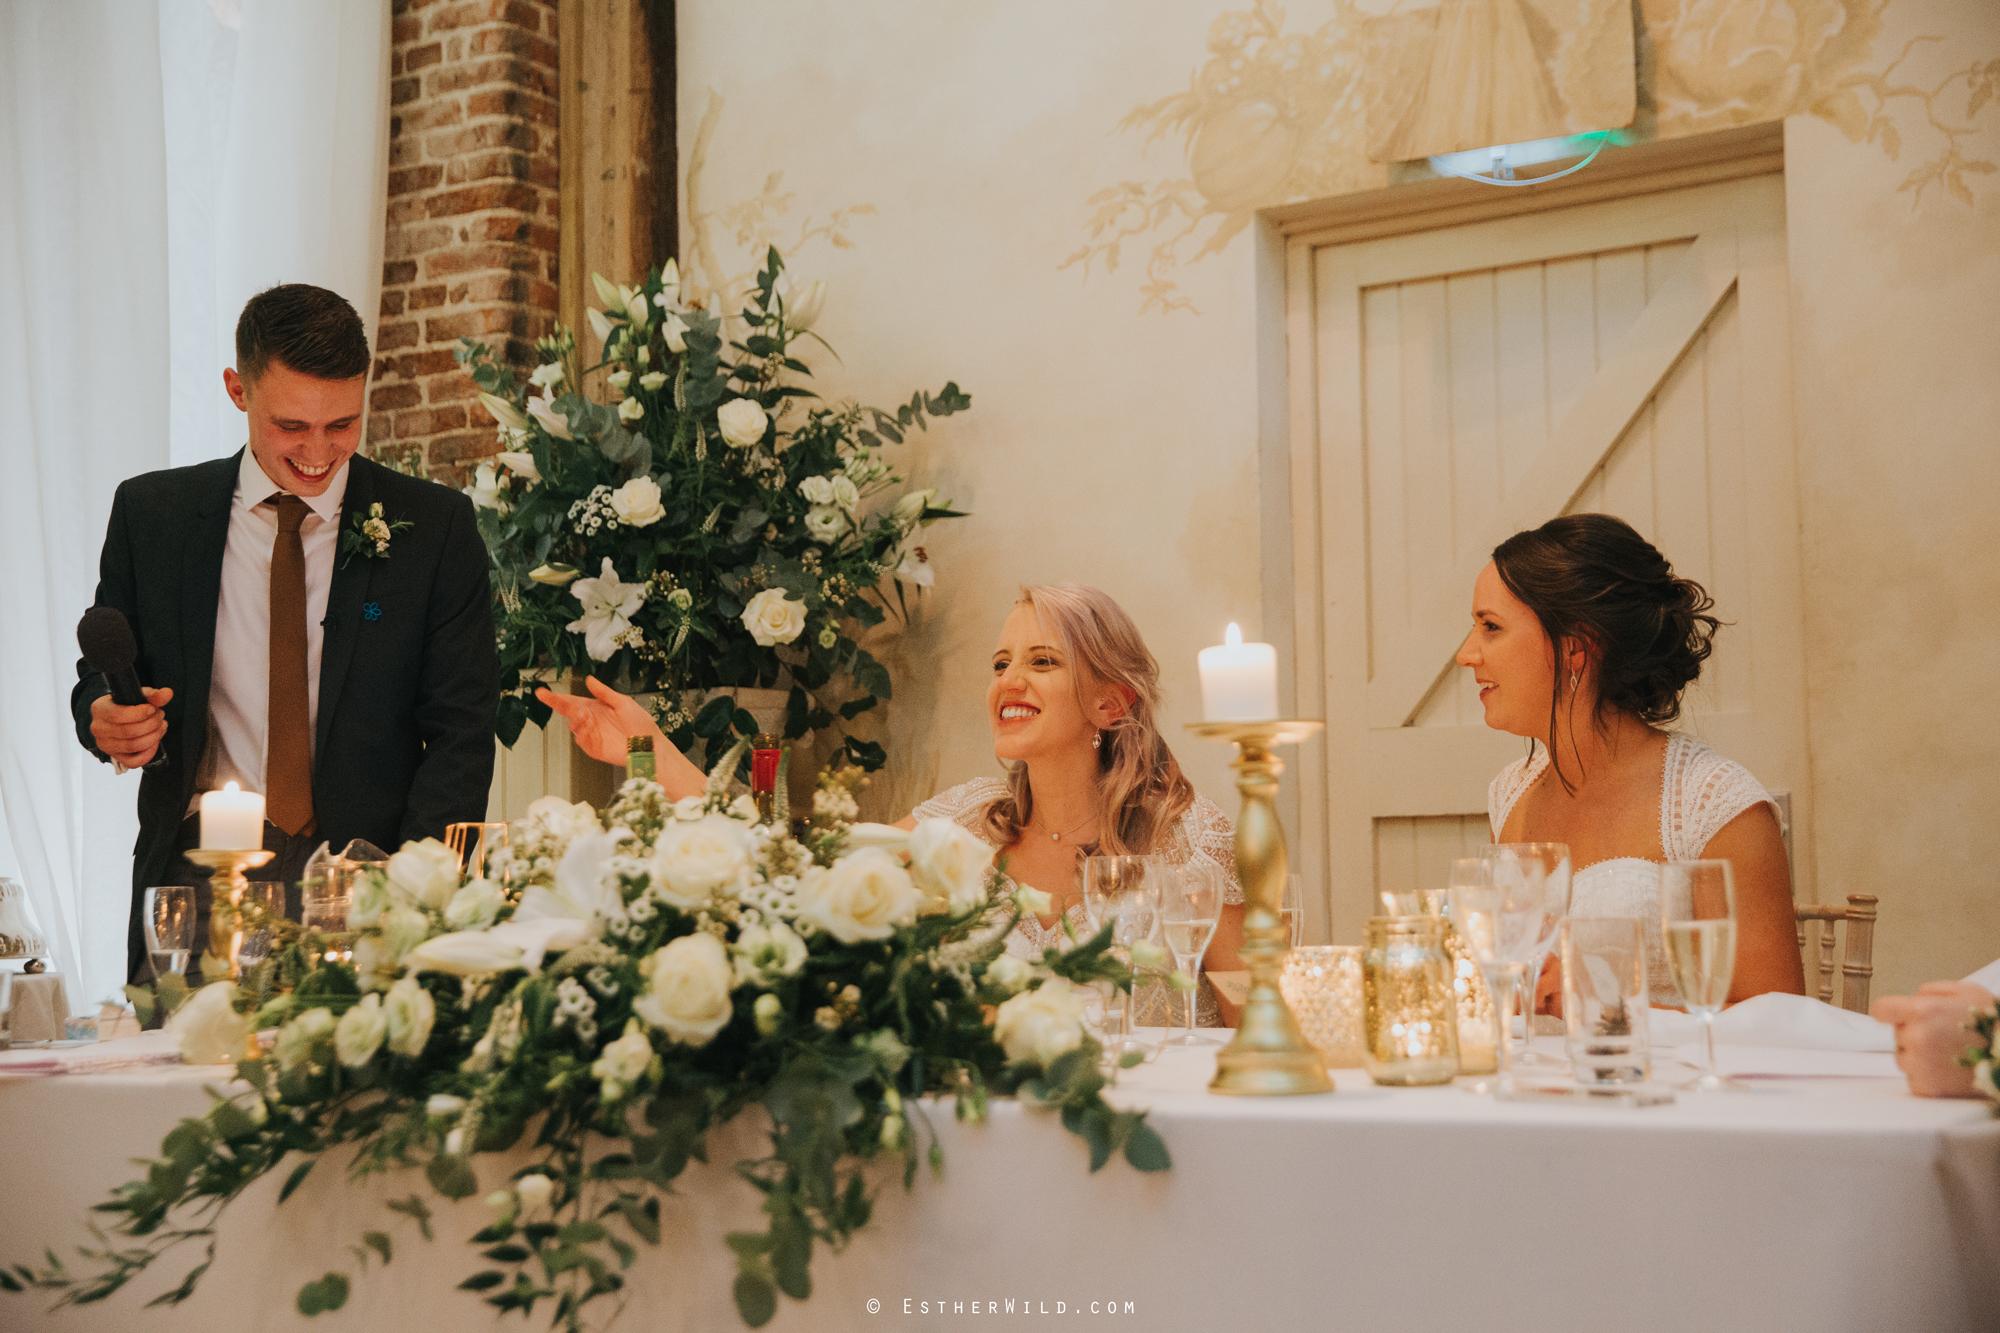 Elms_Barn_Weddings_Suffolk_Photographer_Copyright_Esther_Wild_IMG_2837.jpg